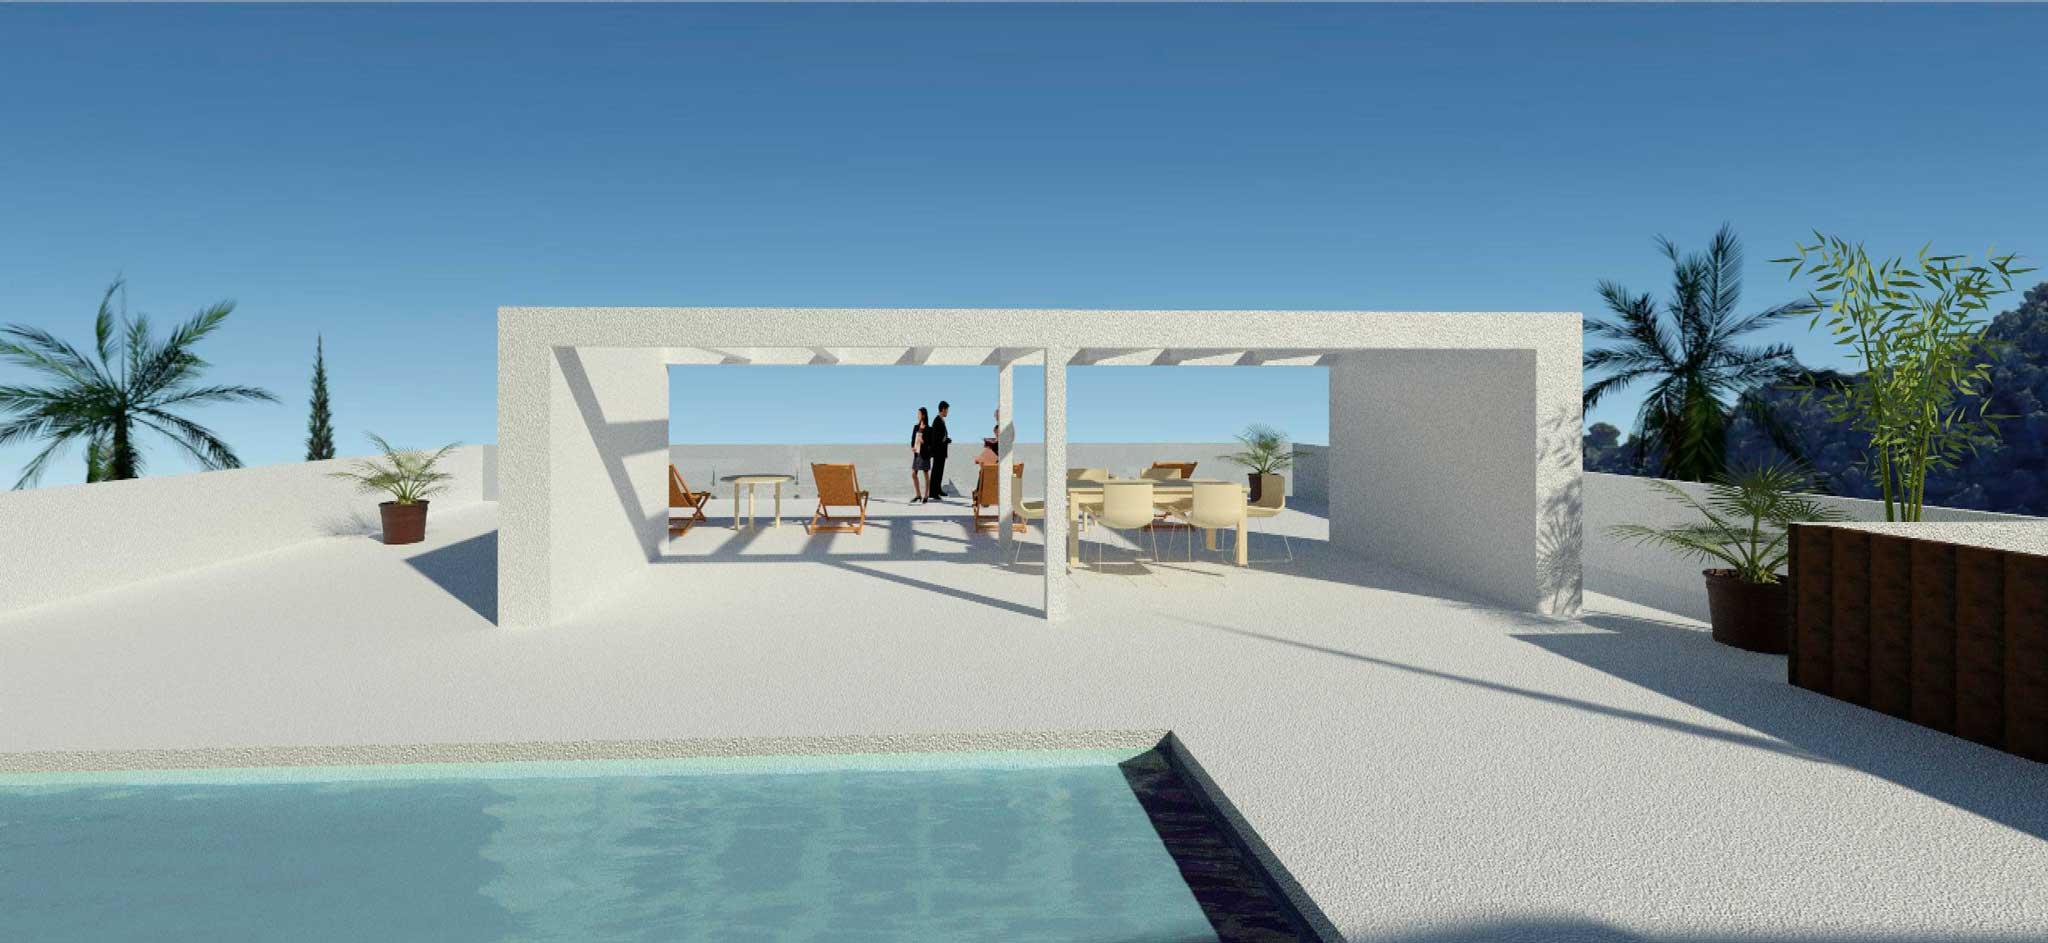 Anteproyecto Cala Llonga – Quitec